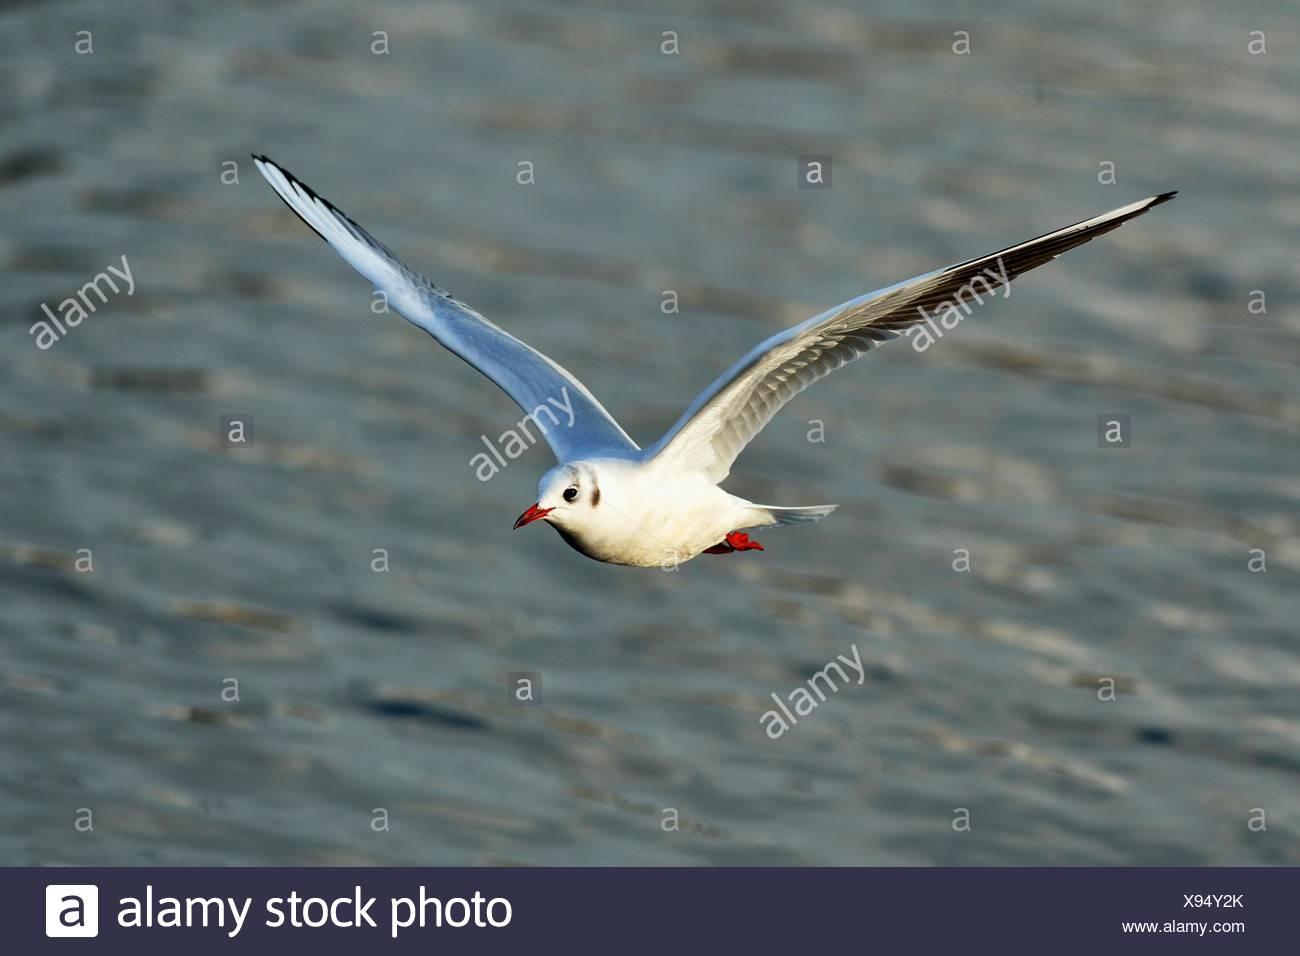 Black-headed Black-headed Gull (Chroicocephalus ridibundus, Larus ridibundus) in flight, Lake Zug, Canton of Zug, Switzerland Stock Photo